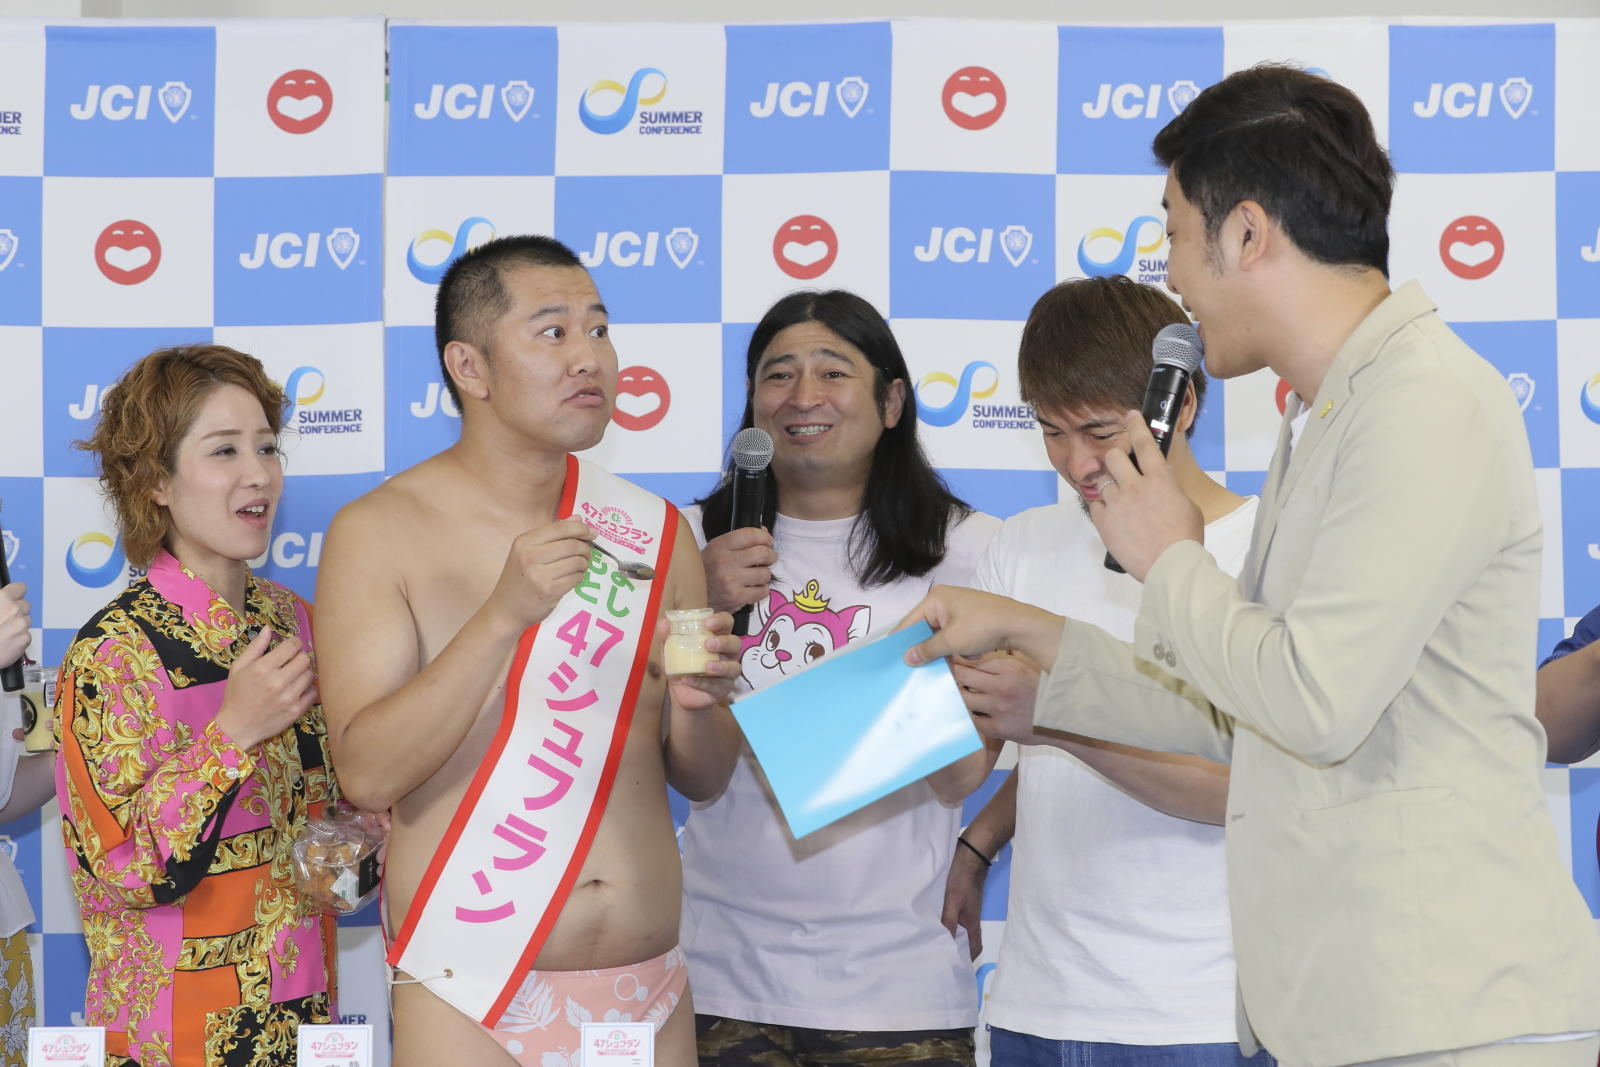 http://news.yoshimoto.co.jp/20170714133727-da210c06b782c2ed52369540996eb180b330331a.jpg